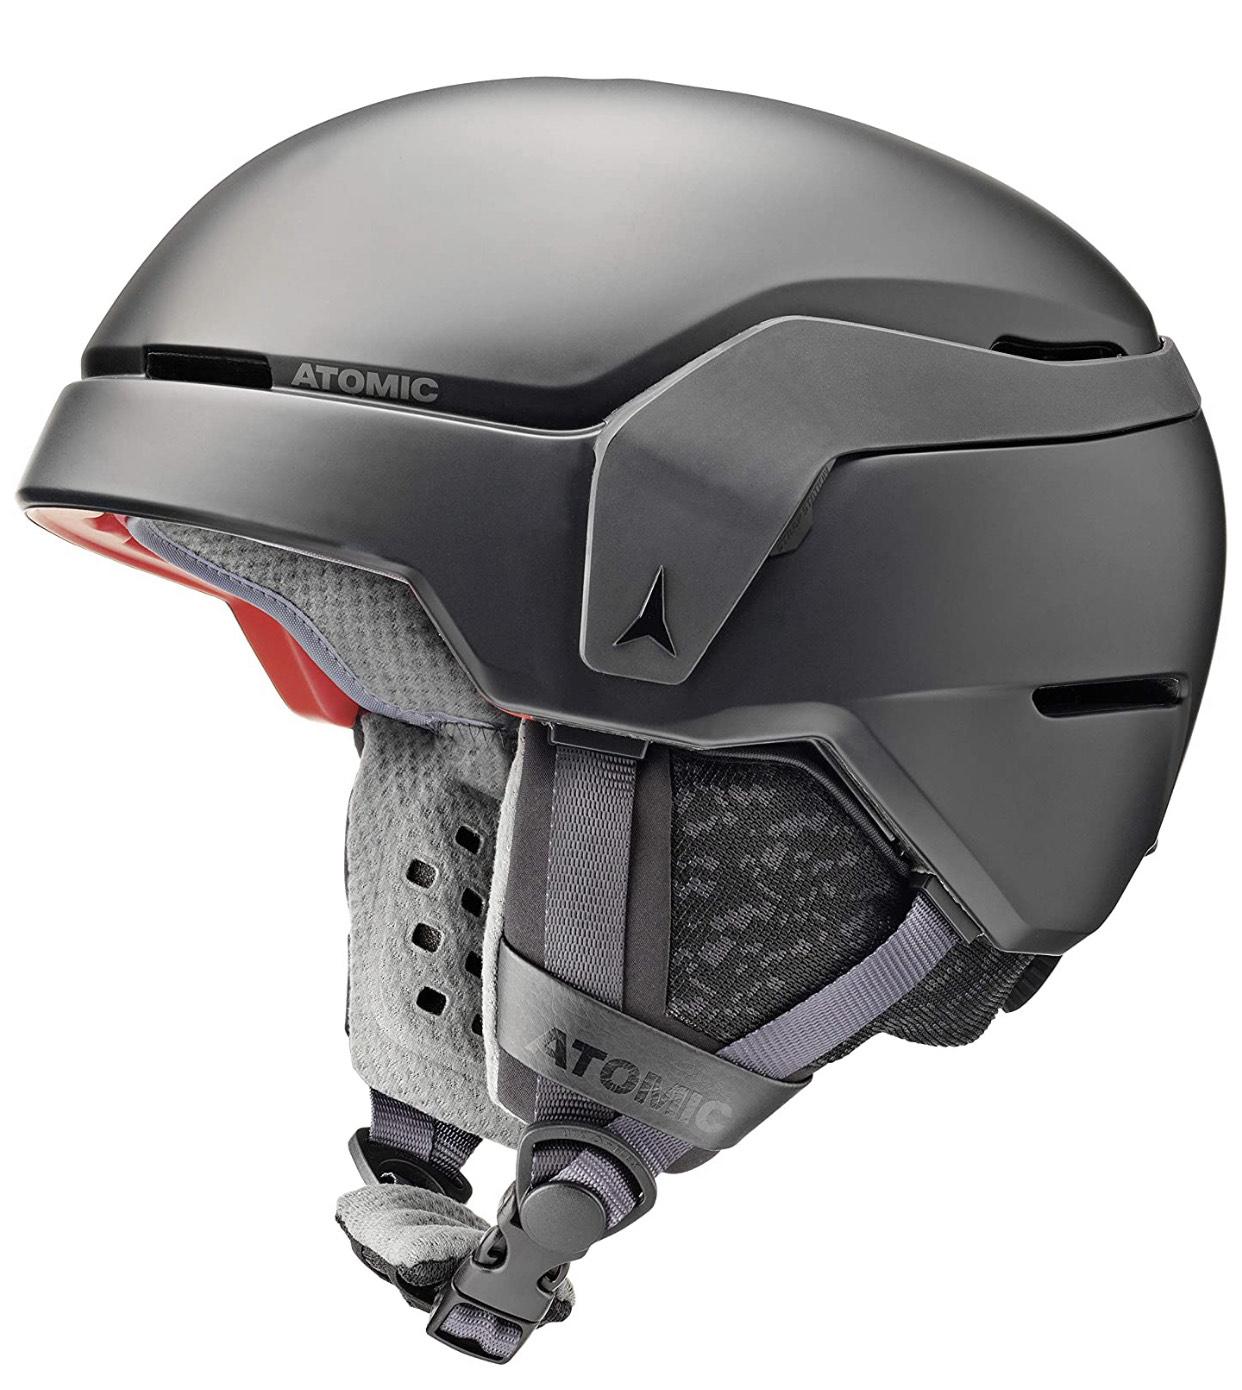 Atomic Count Ski Helmet (large - 59-63cm) £18.16 + £4.49 NP @ Amazon